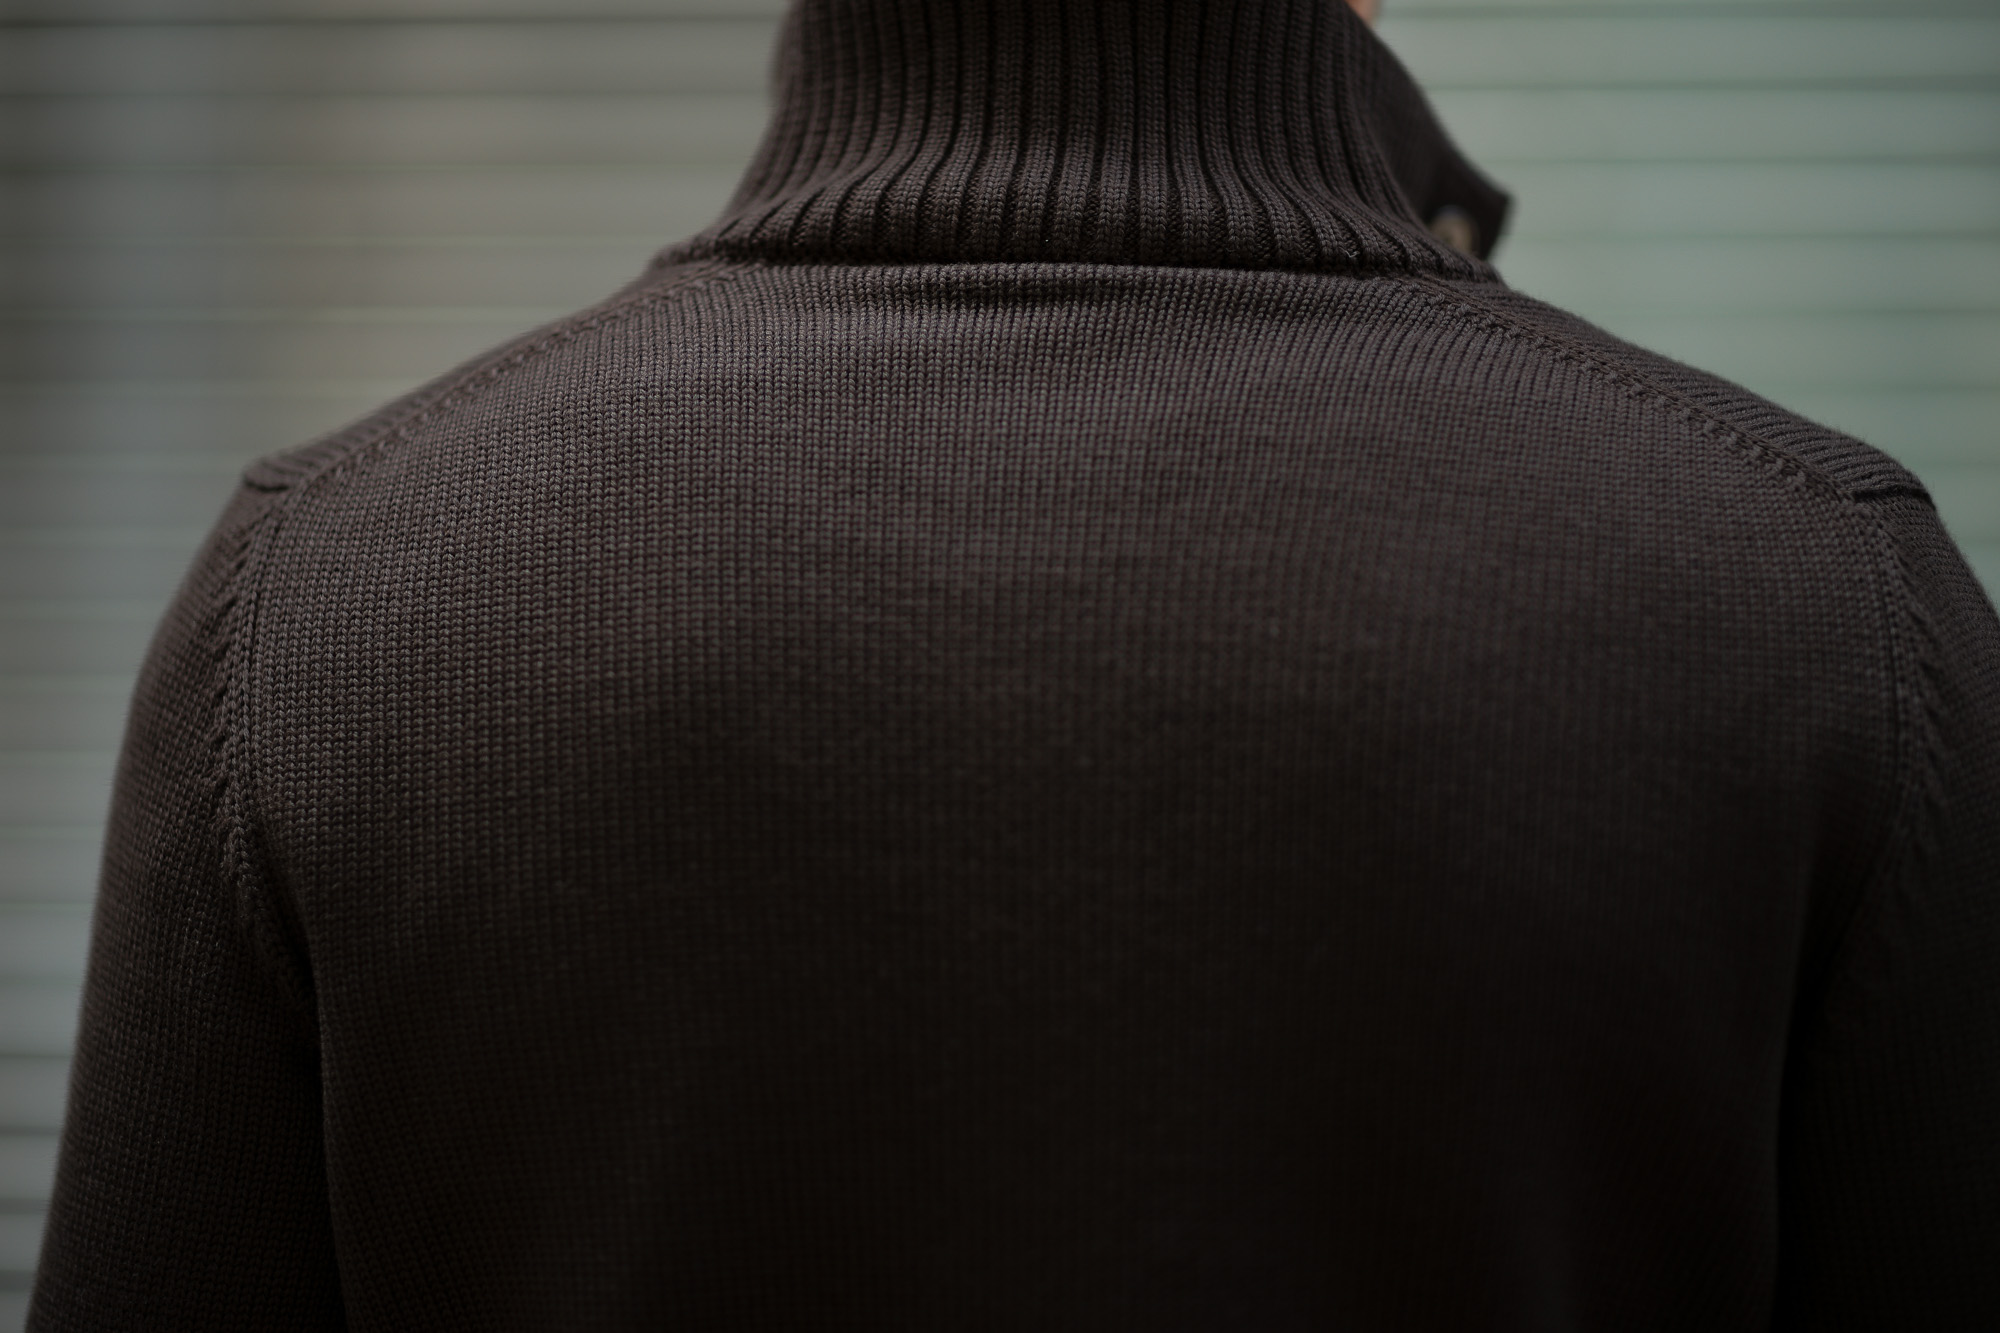 ZANONE (ザノーネ) CHIOTO KYOTO (キョウト キョート) 812218 z0229 (ミドルゲージ ニット ジャケット) BROWN (ブラウン・Z5204) MADE IN ITALY(イタリア製) 2019 秋冬 【ご予約受付中】zanone 愛知 名古屋 Alto e Diritto アルト エ デリット alto e diritto アルトエデリット ニット